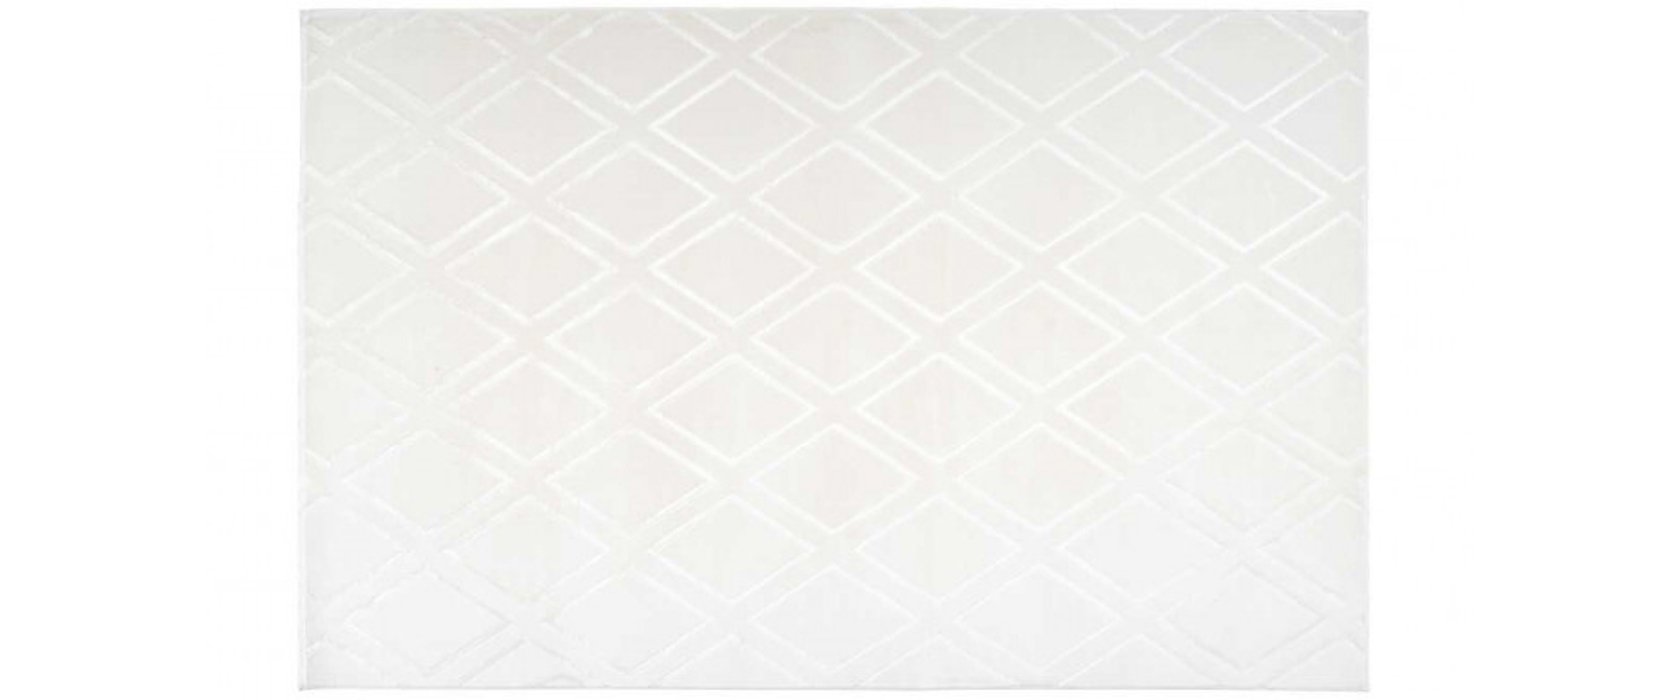 Килим Monroe 300 romb White - Pufetto